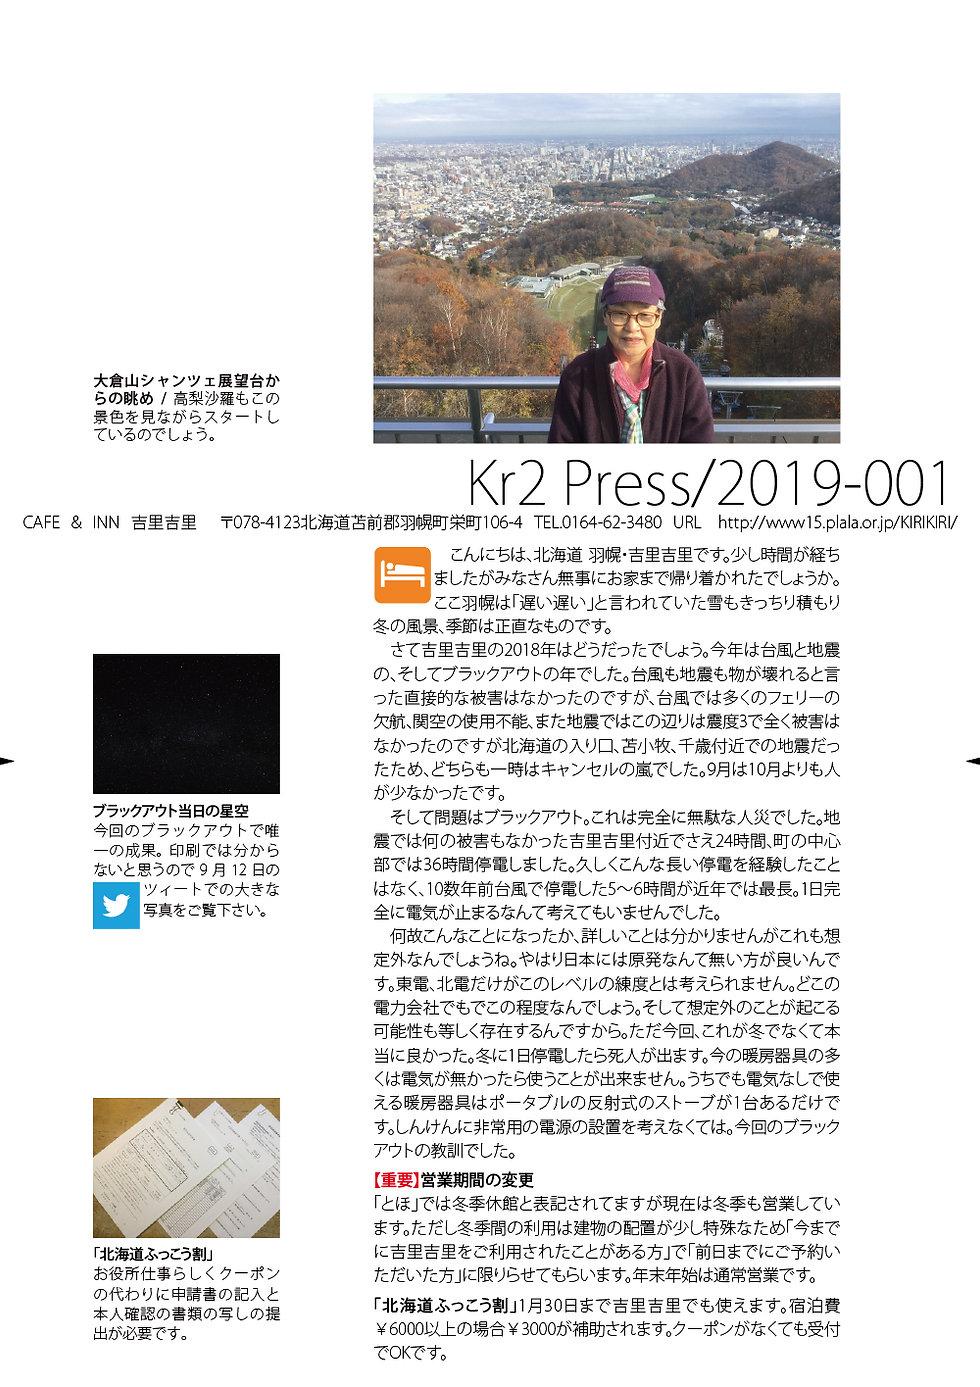 2019Kr2Press01.jpg